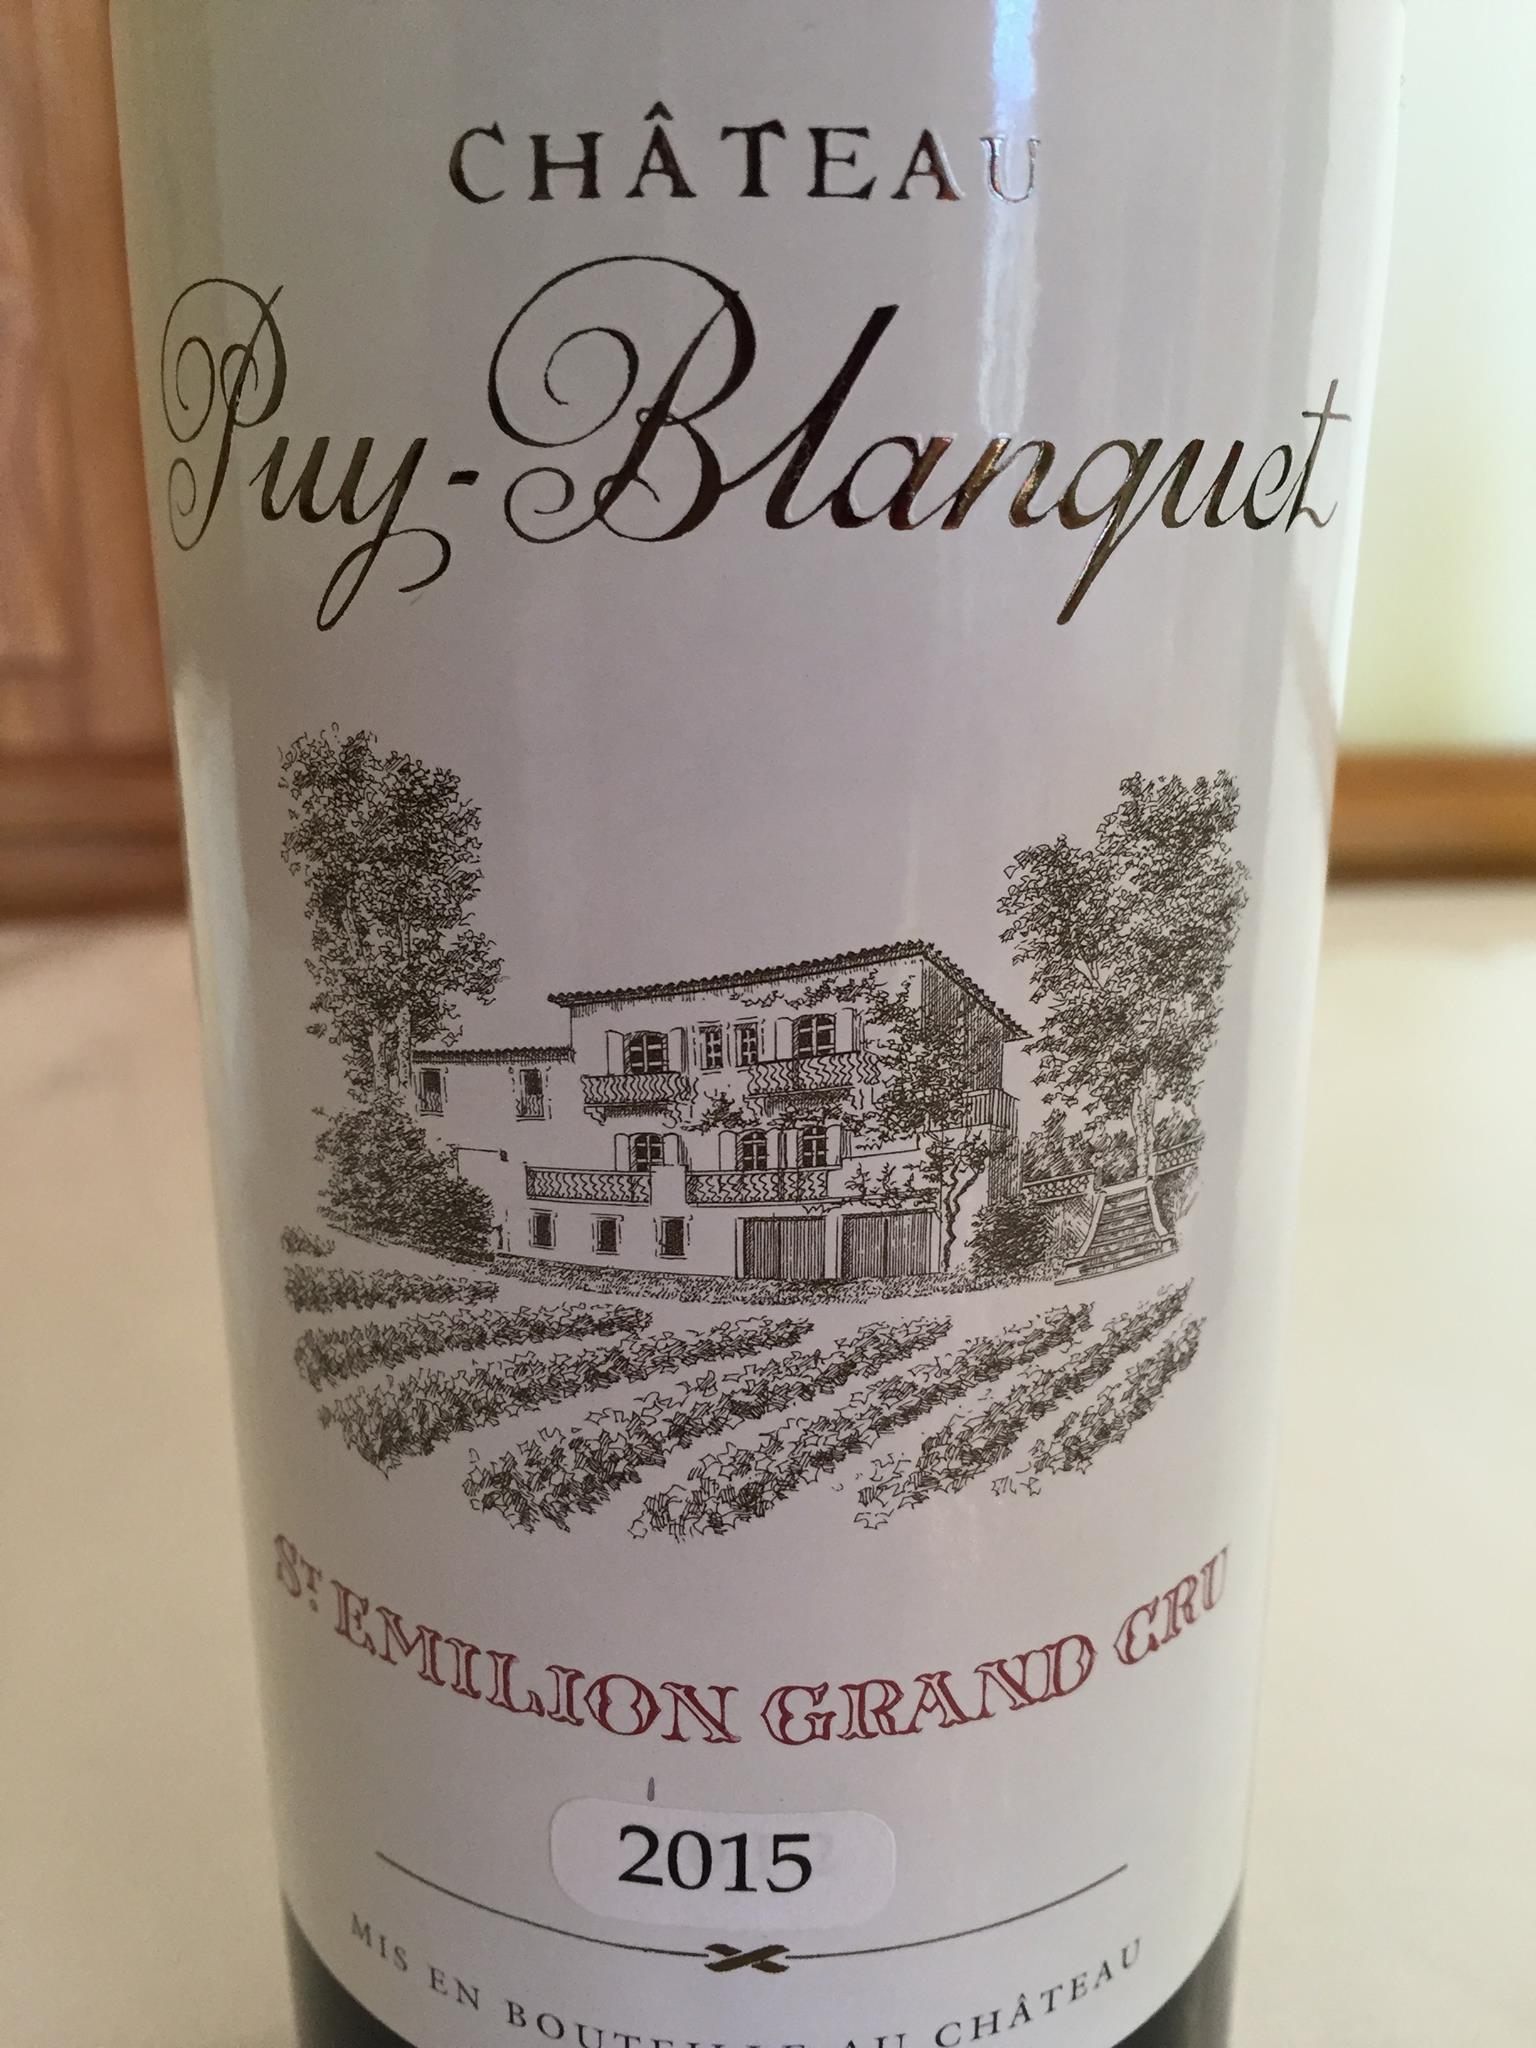 Château Puy-Blanquet 2015 – Saint-Emilion Grand Cru